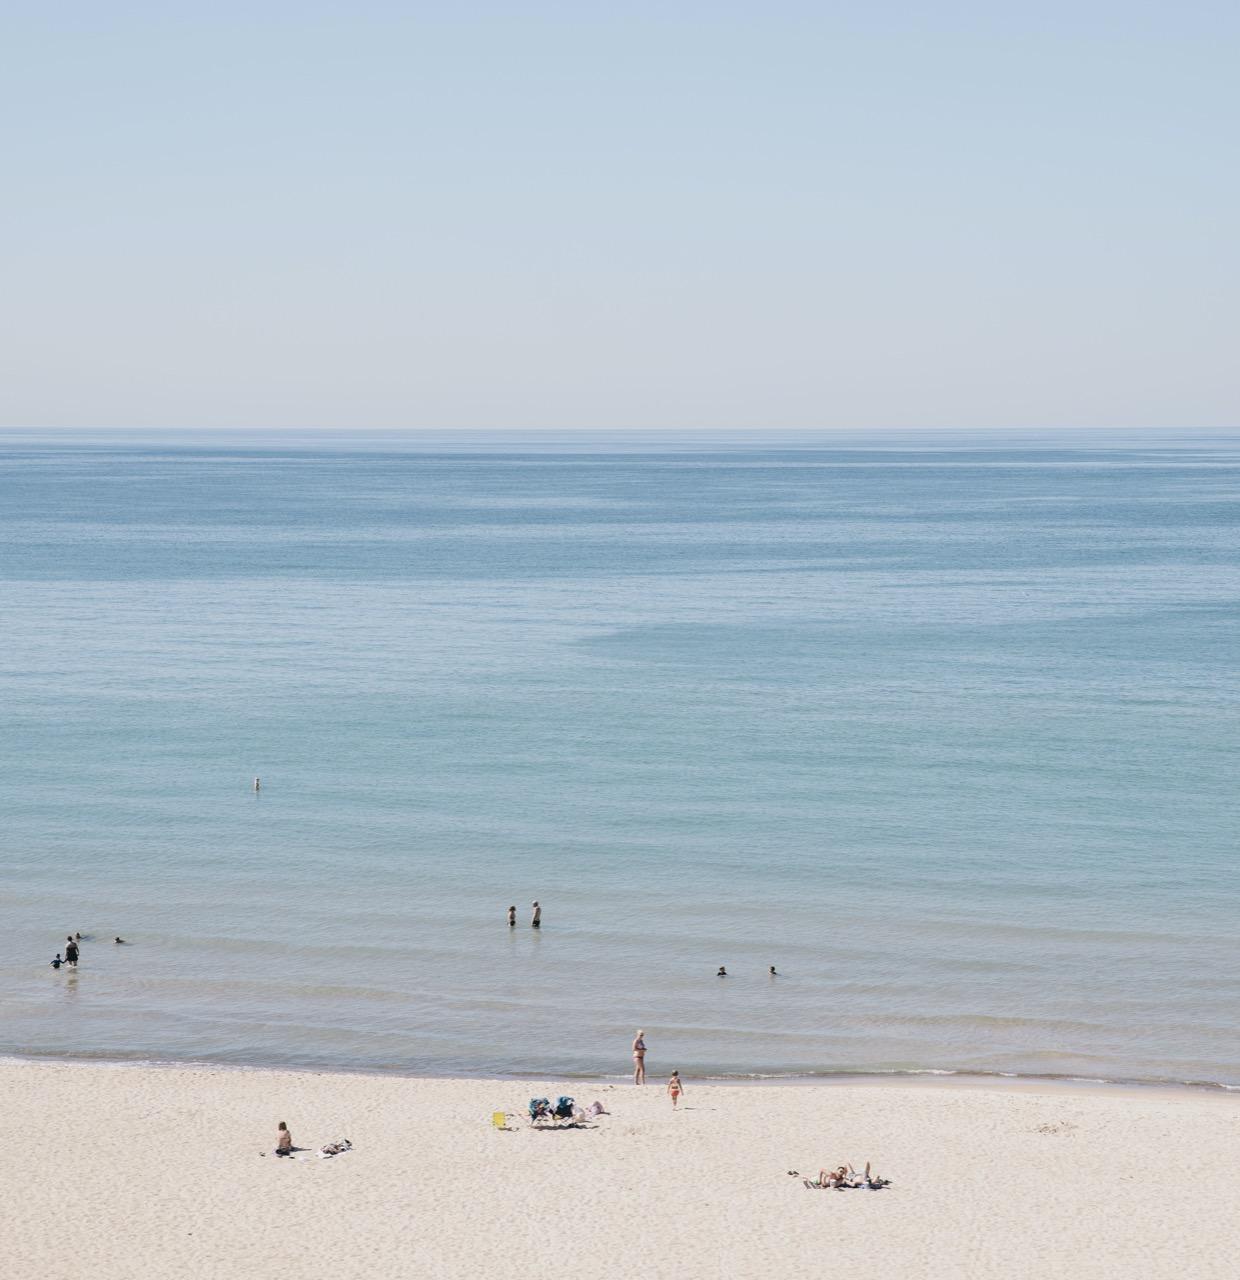 Beach in Indiana